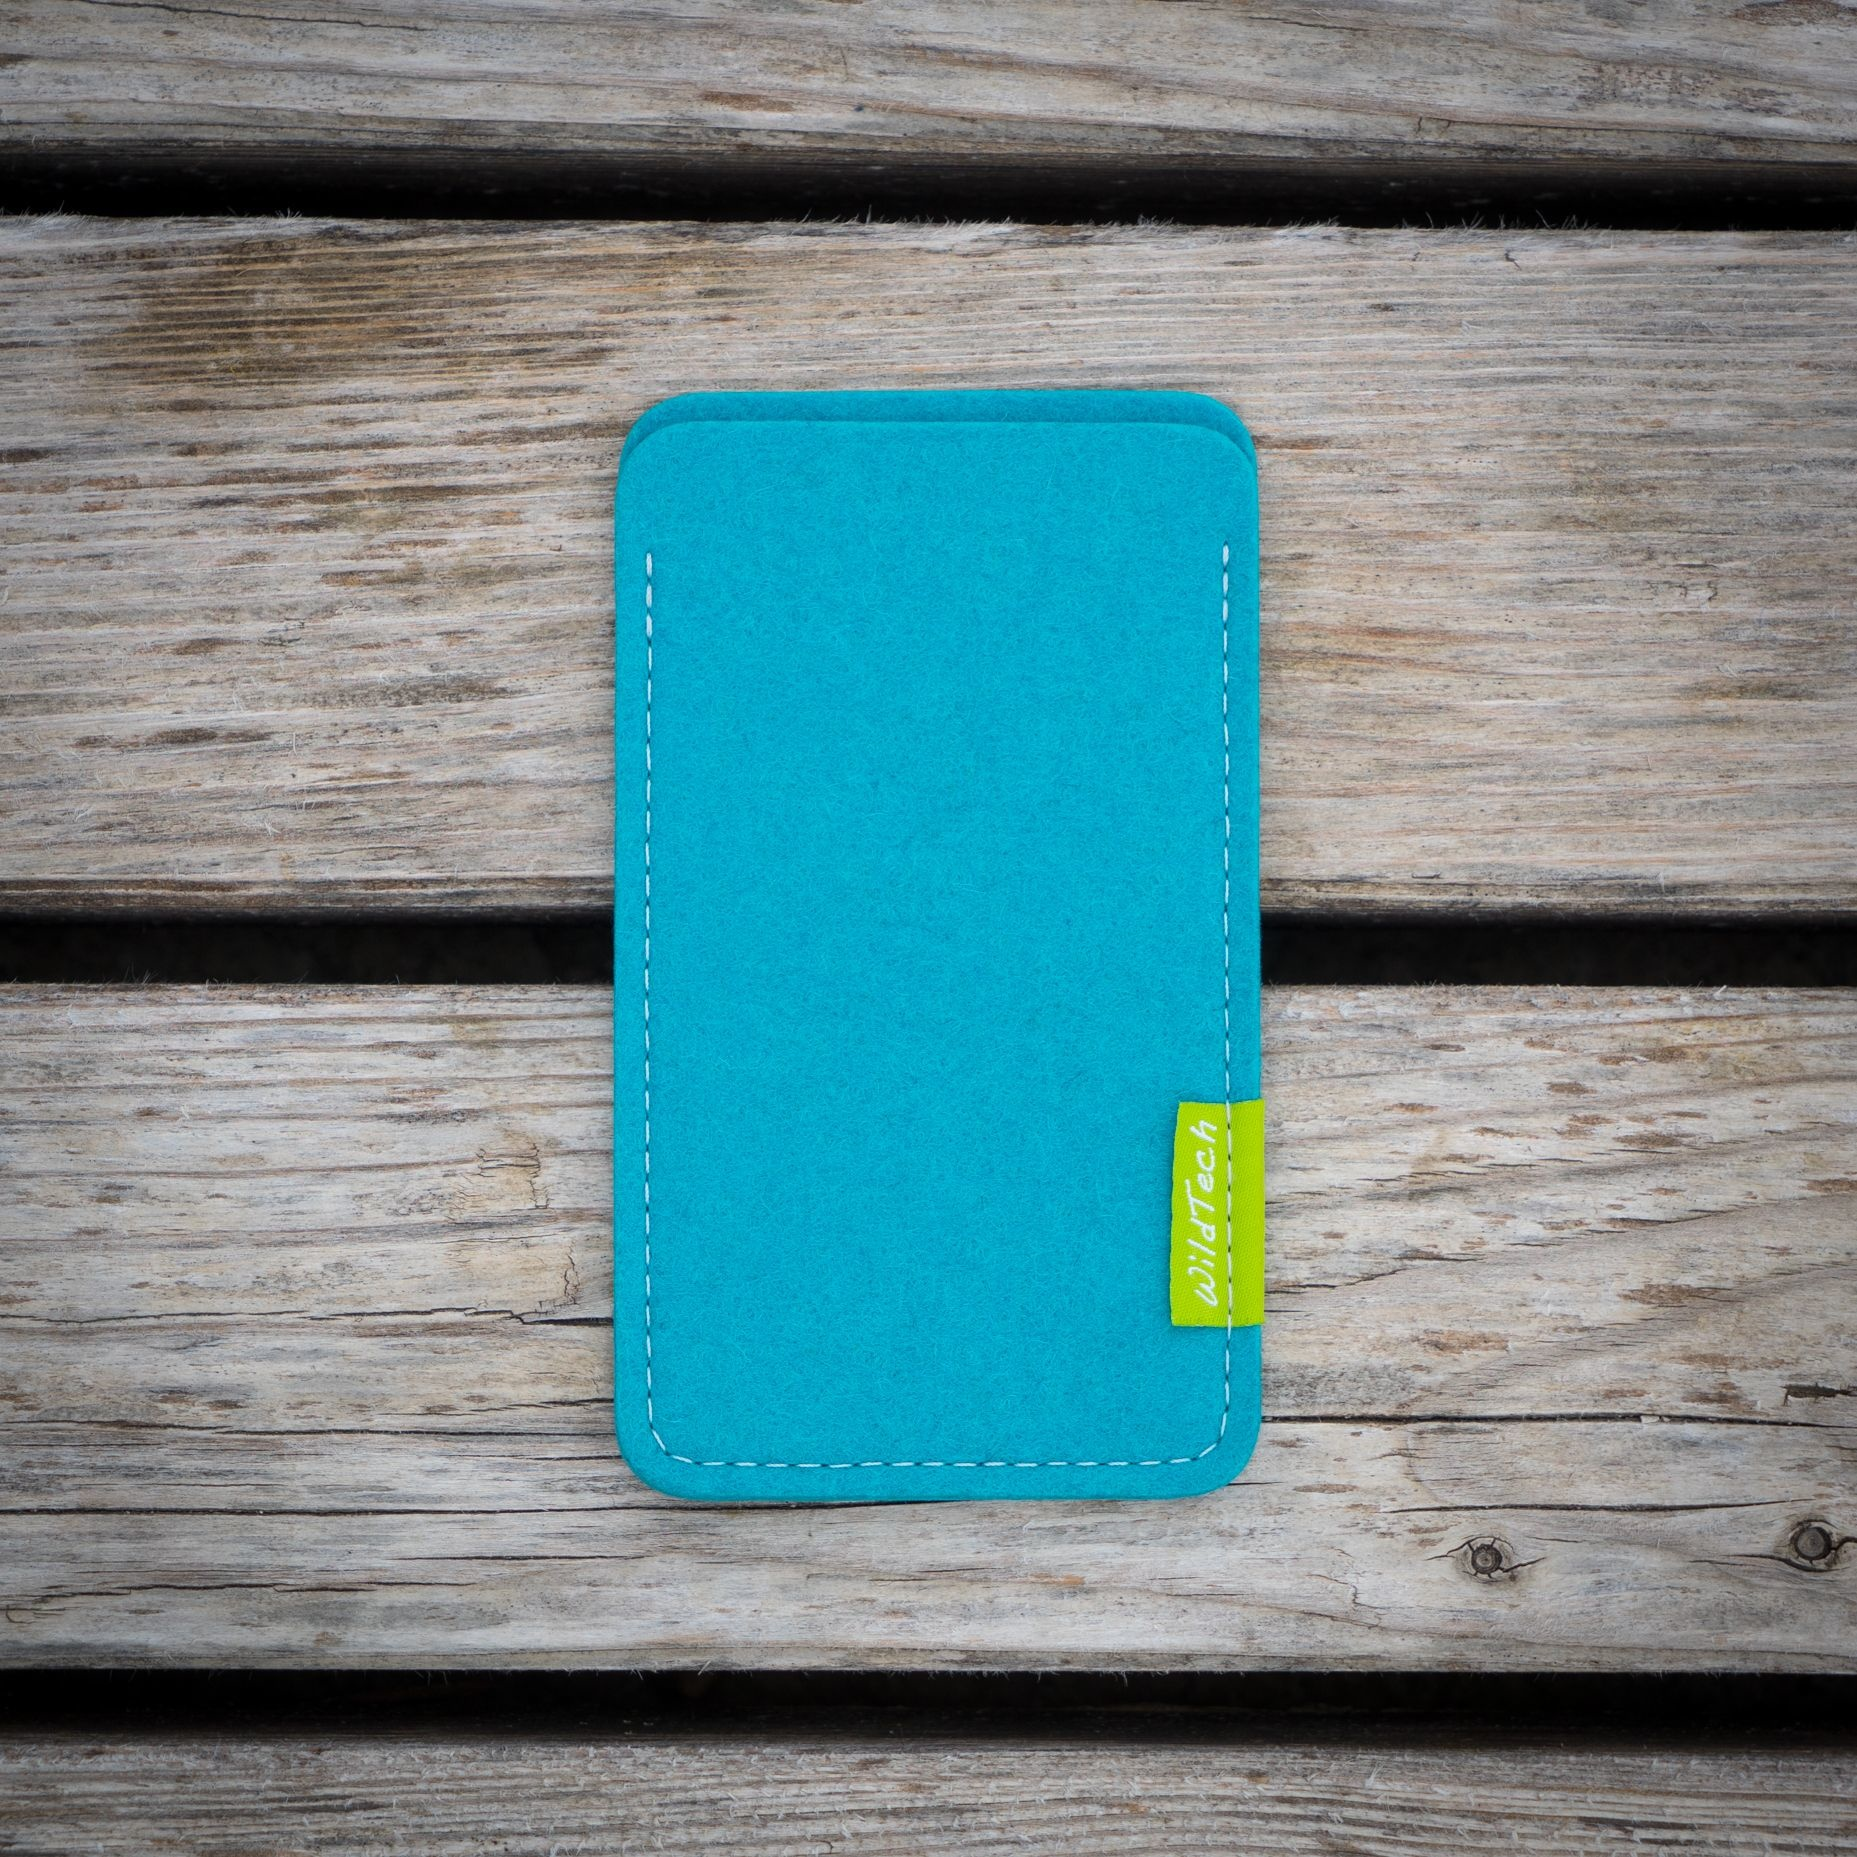 Sleeve Turquoise-2